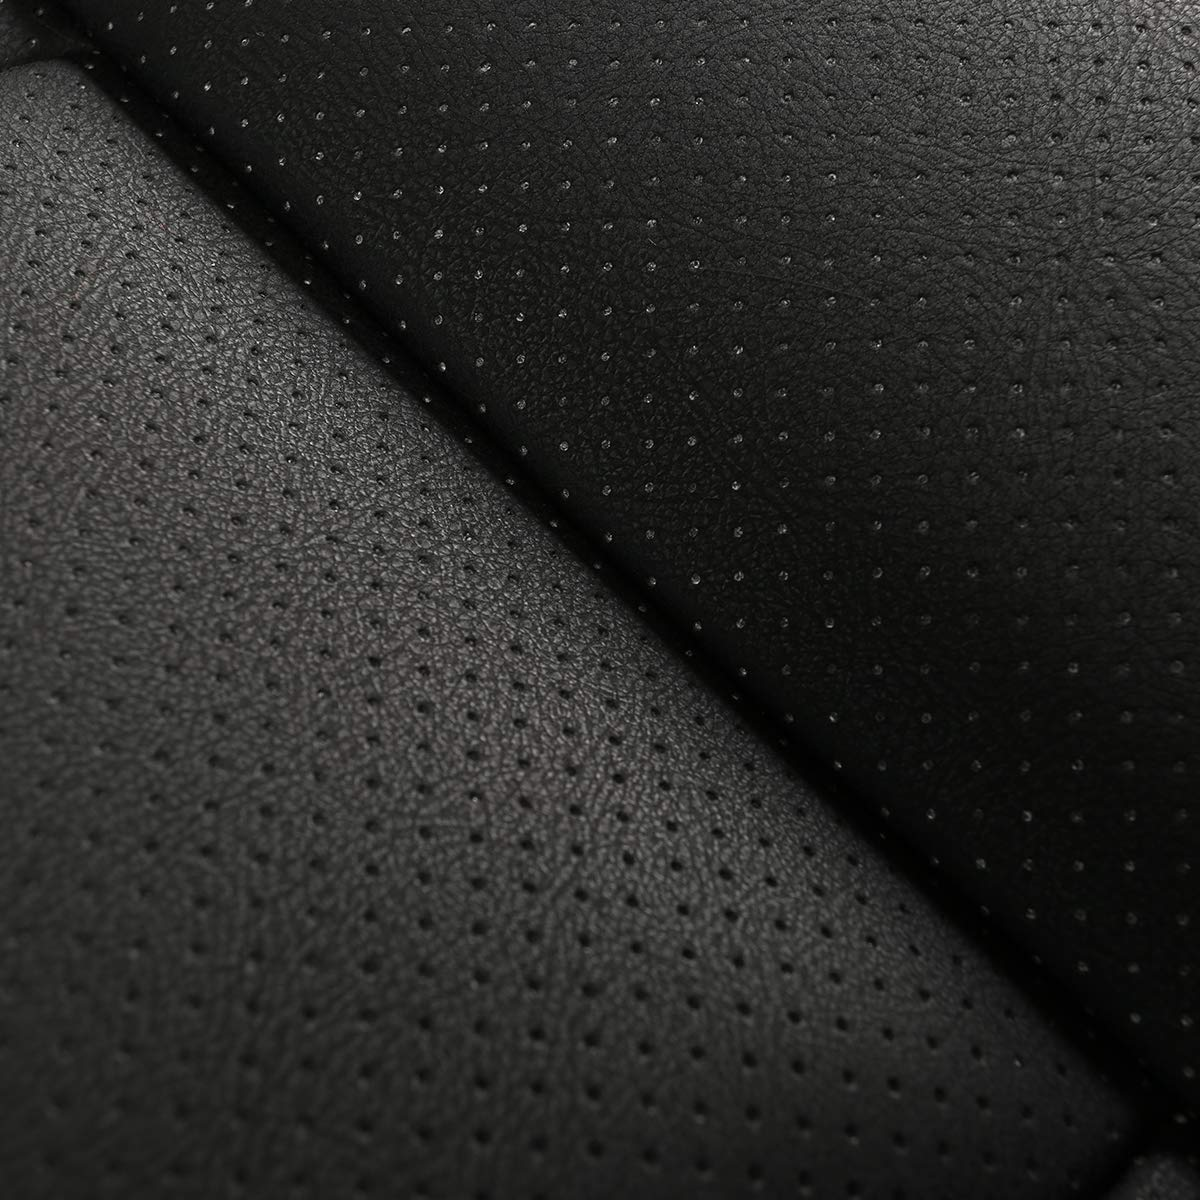 gris cuero de la PU transpirable C/ómodo antideslizante Health Car Seat Coj/ín para Four Seasons Universal SENSUES Car Seat Cover